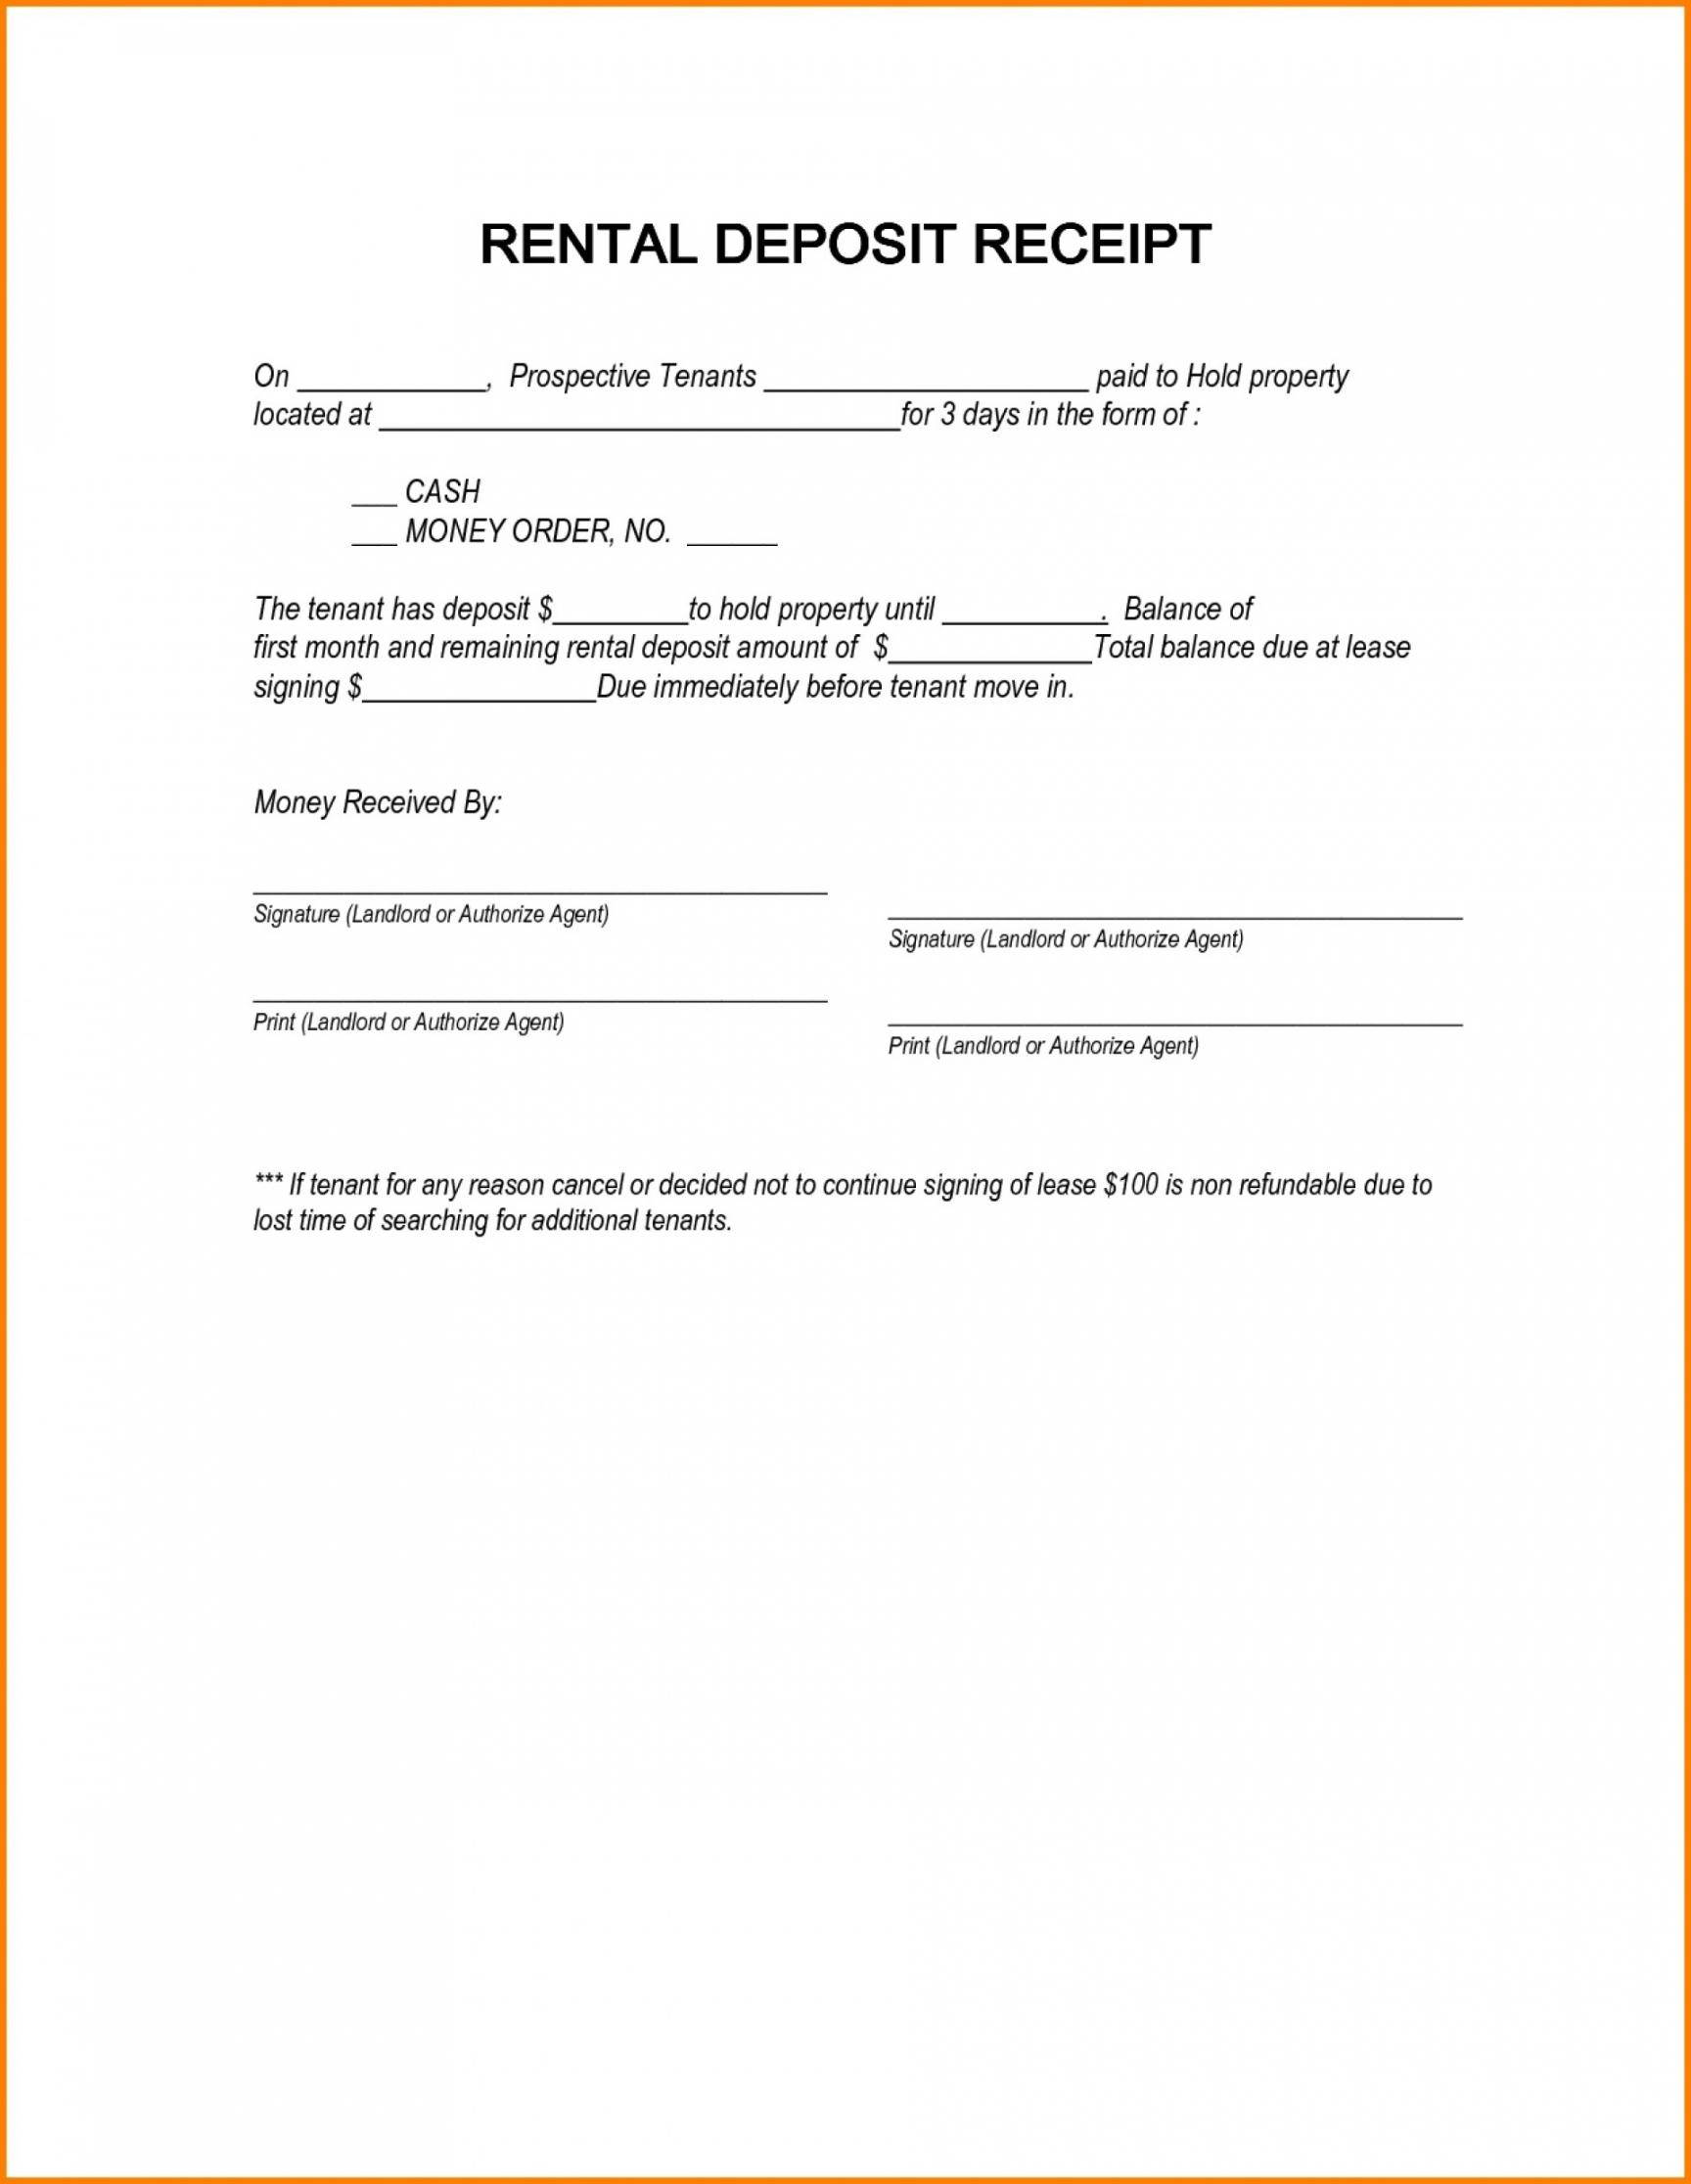 editable 004 security deposit receipt letter template ideas agreement security deposit agreement letter sample